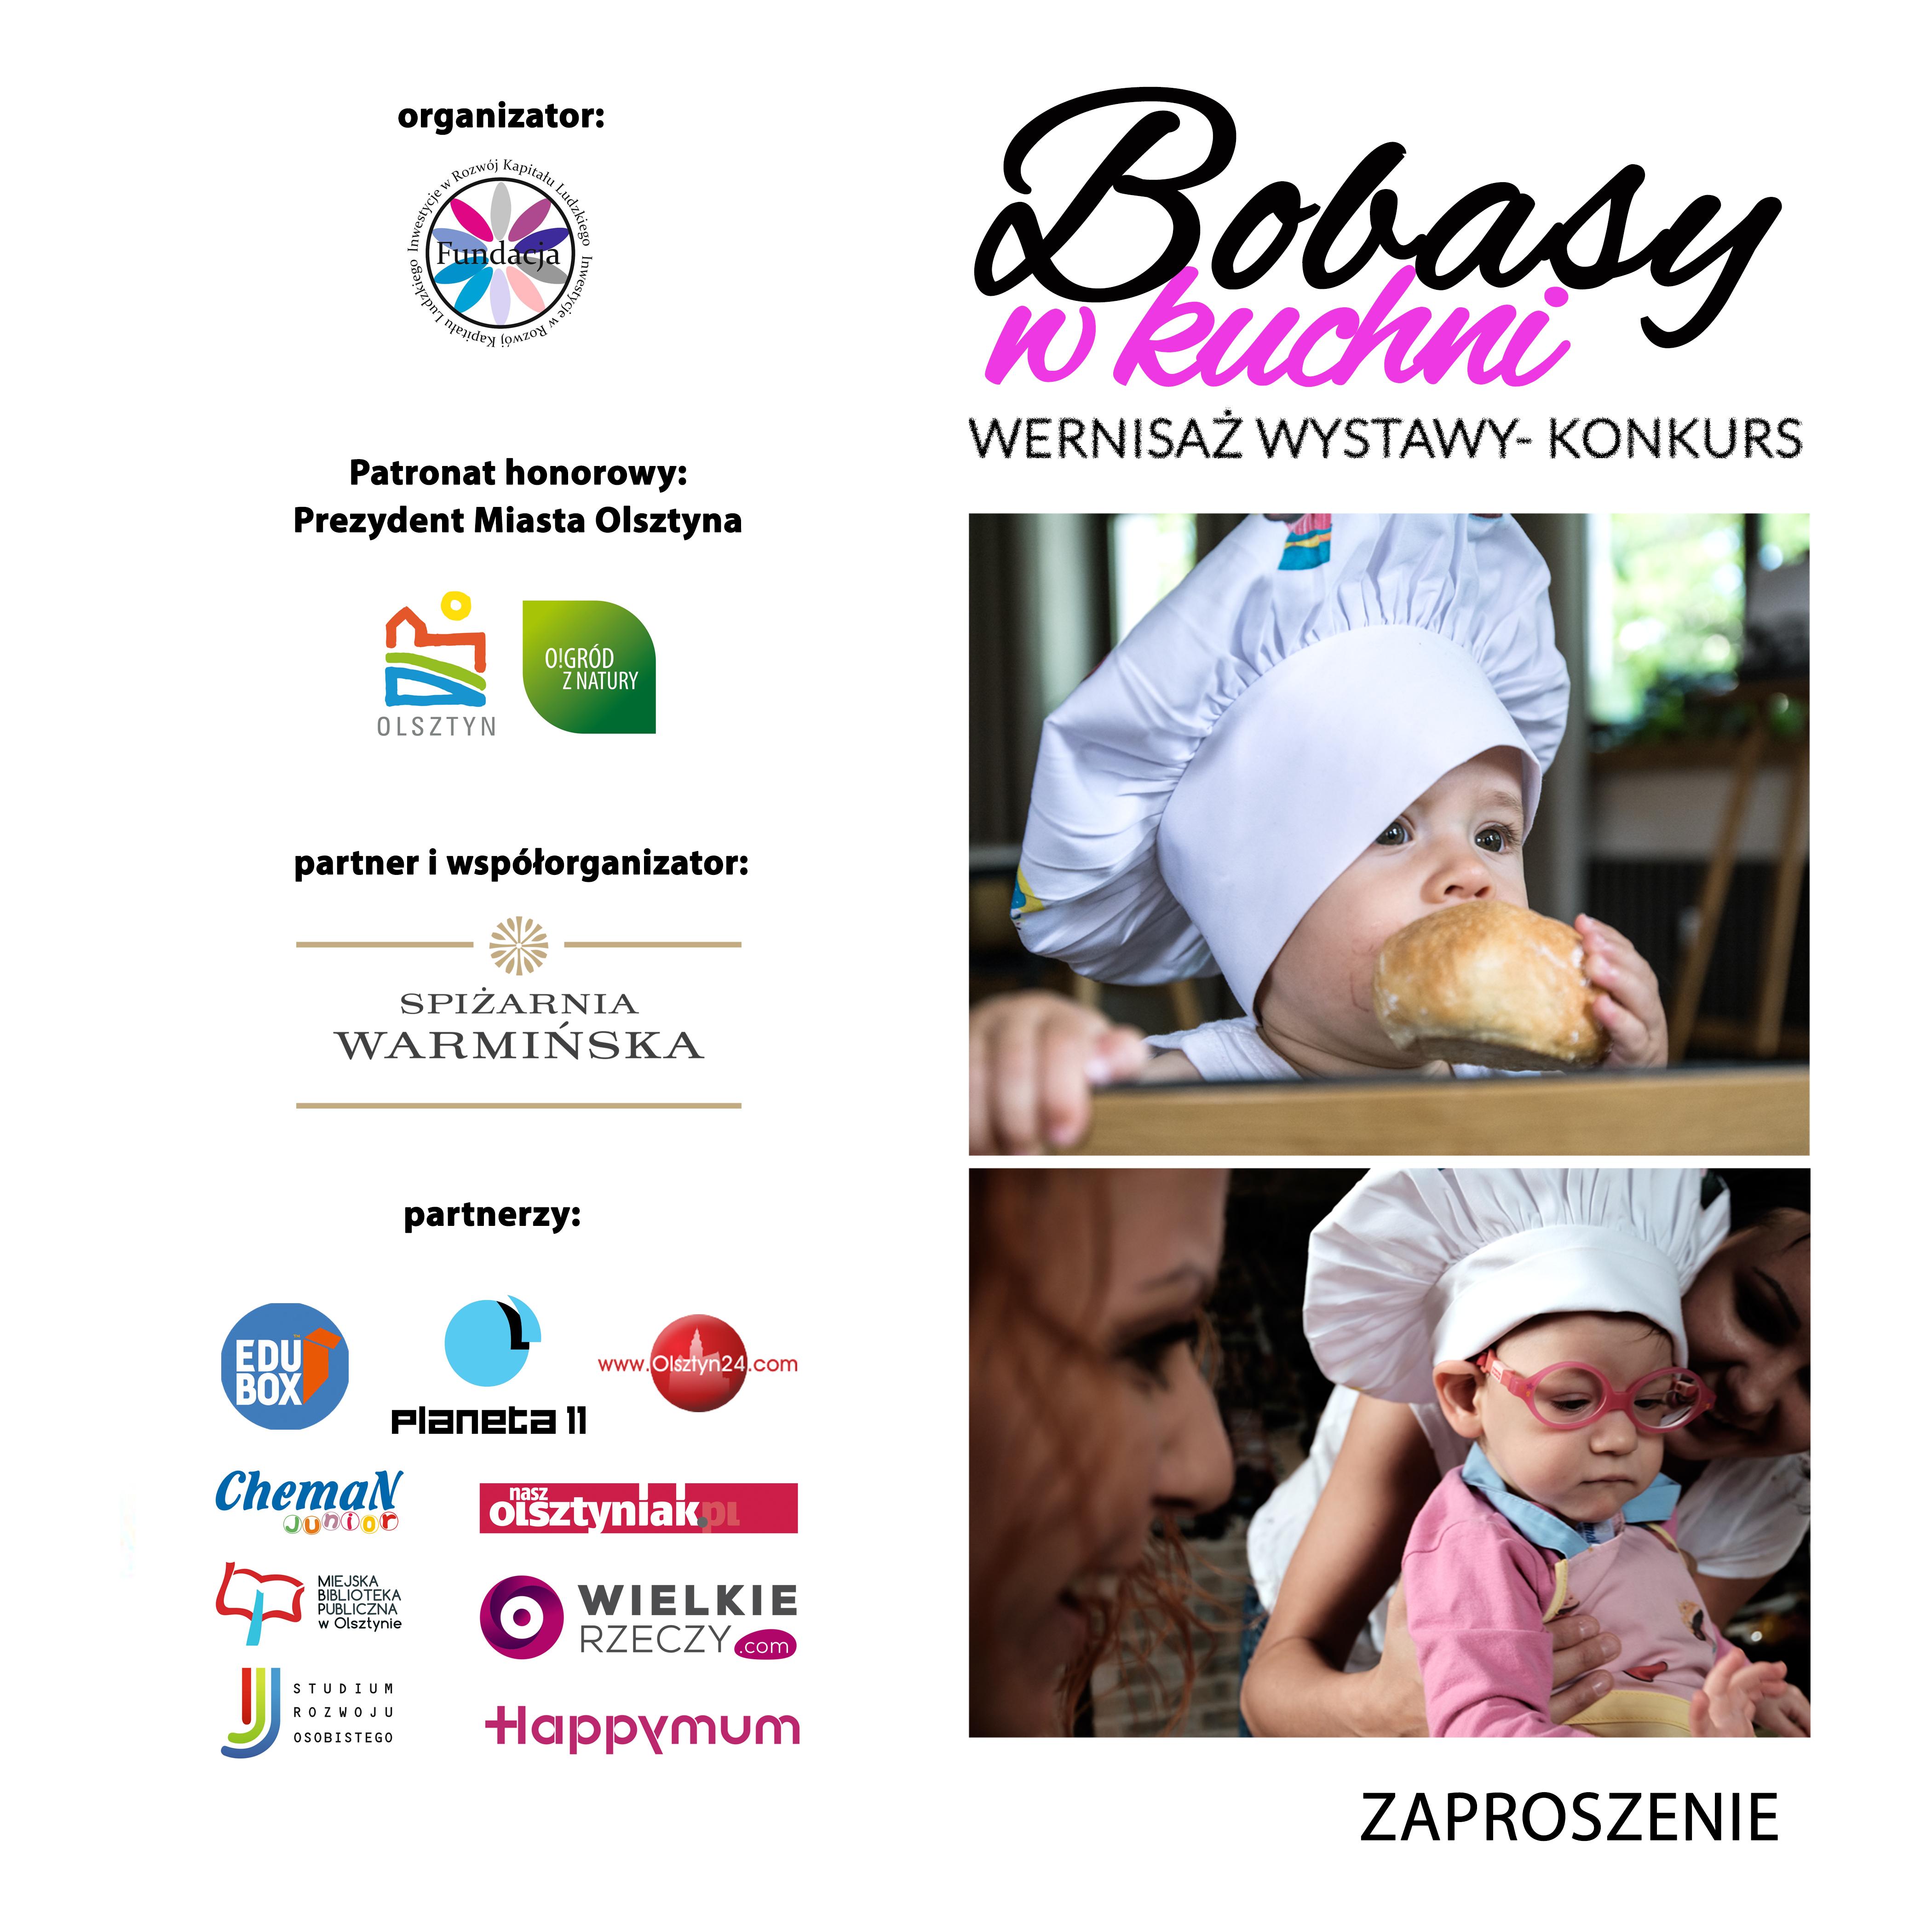 2zaproszenie1 Projekt Bobasy w Kuchni jpg